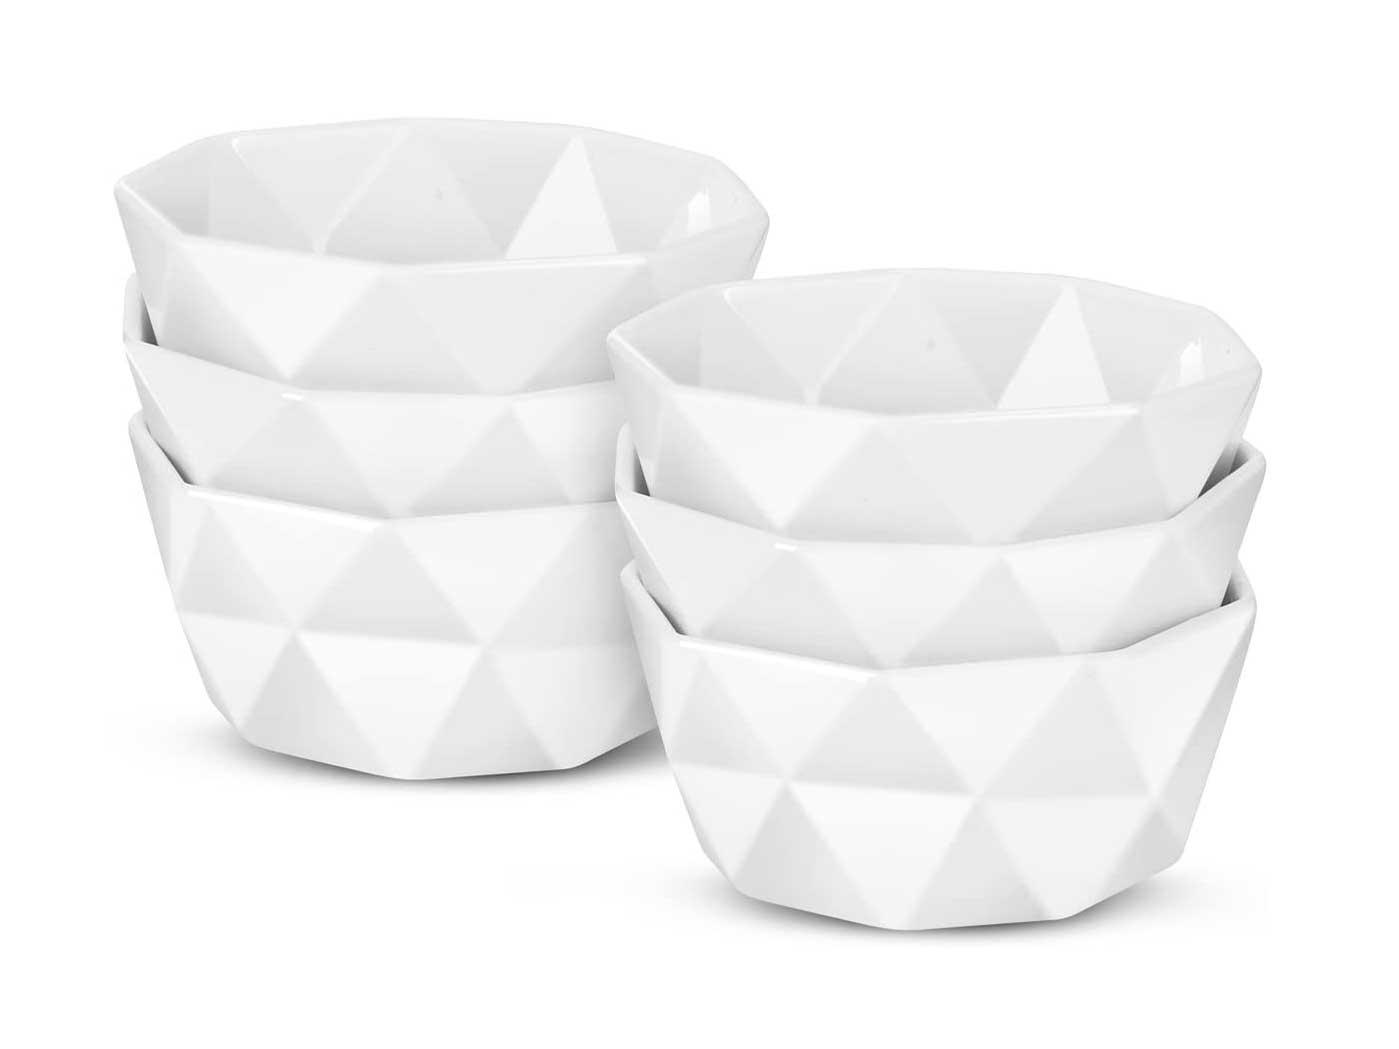 Delling Geometric 8 Oz Porcelain Ramekins/Dessert Bowls,Durable Creme Brulee Dishes Ramekin for Baking, Dessert, Ice Cream, Snack, Souffle - Ramekins Oven Safe -White Ceramic Small Bowl Set of 6